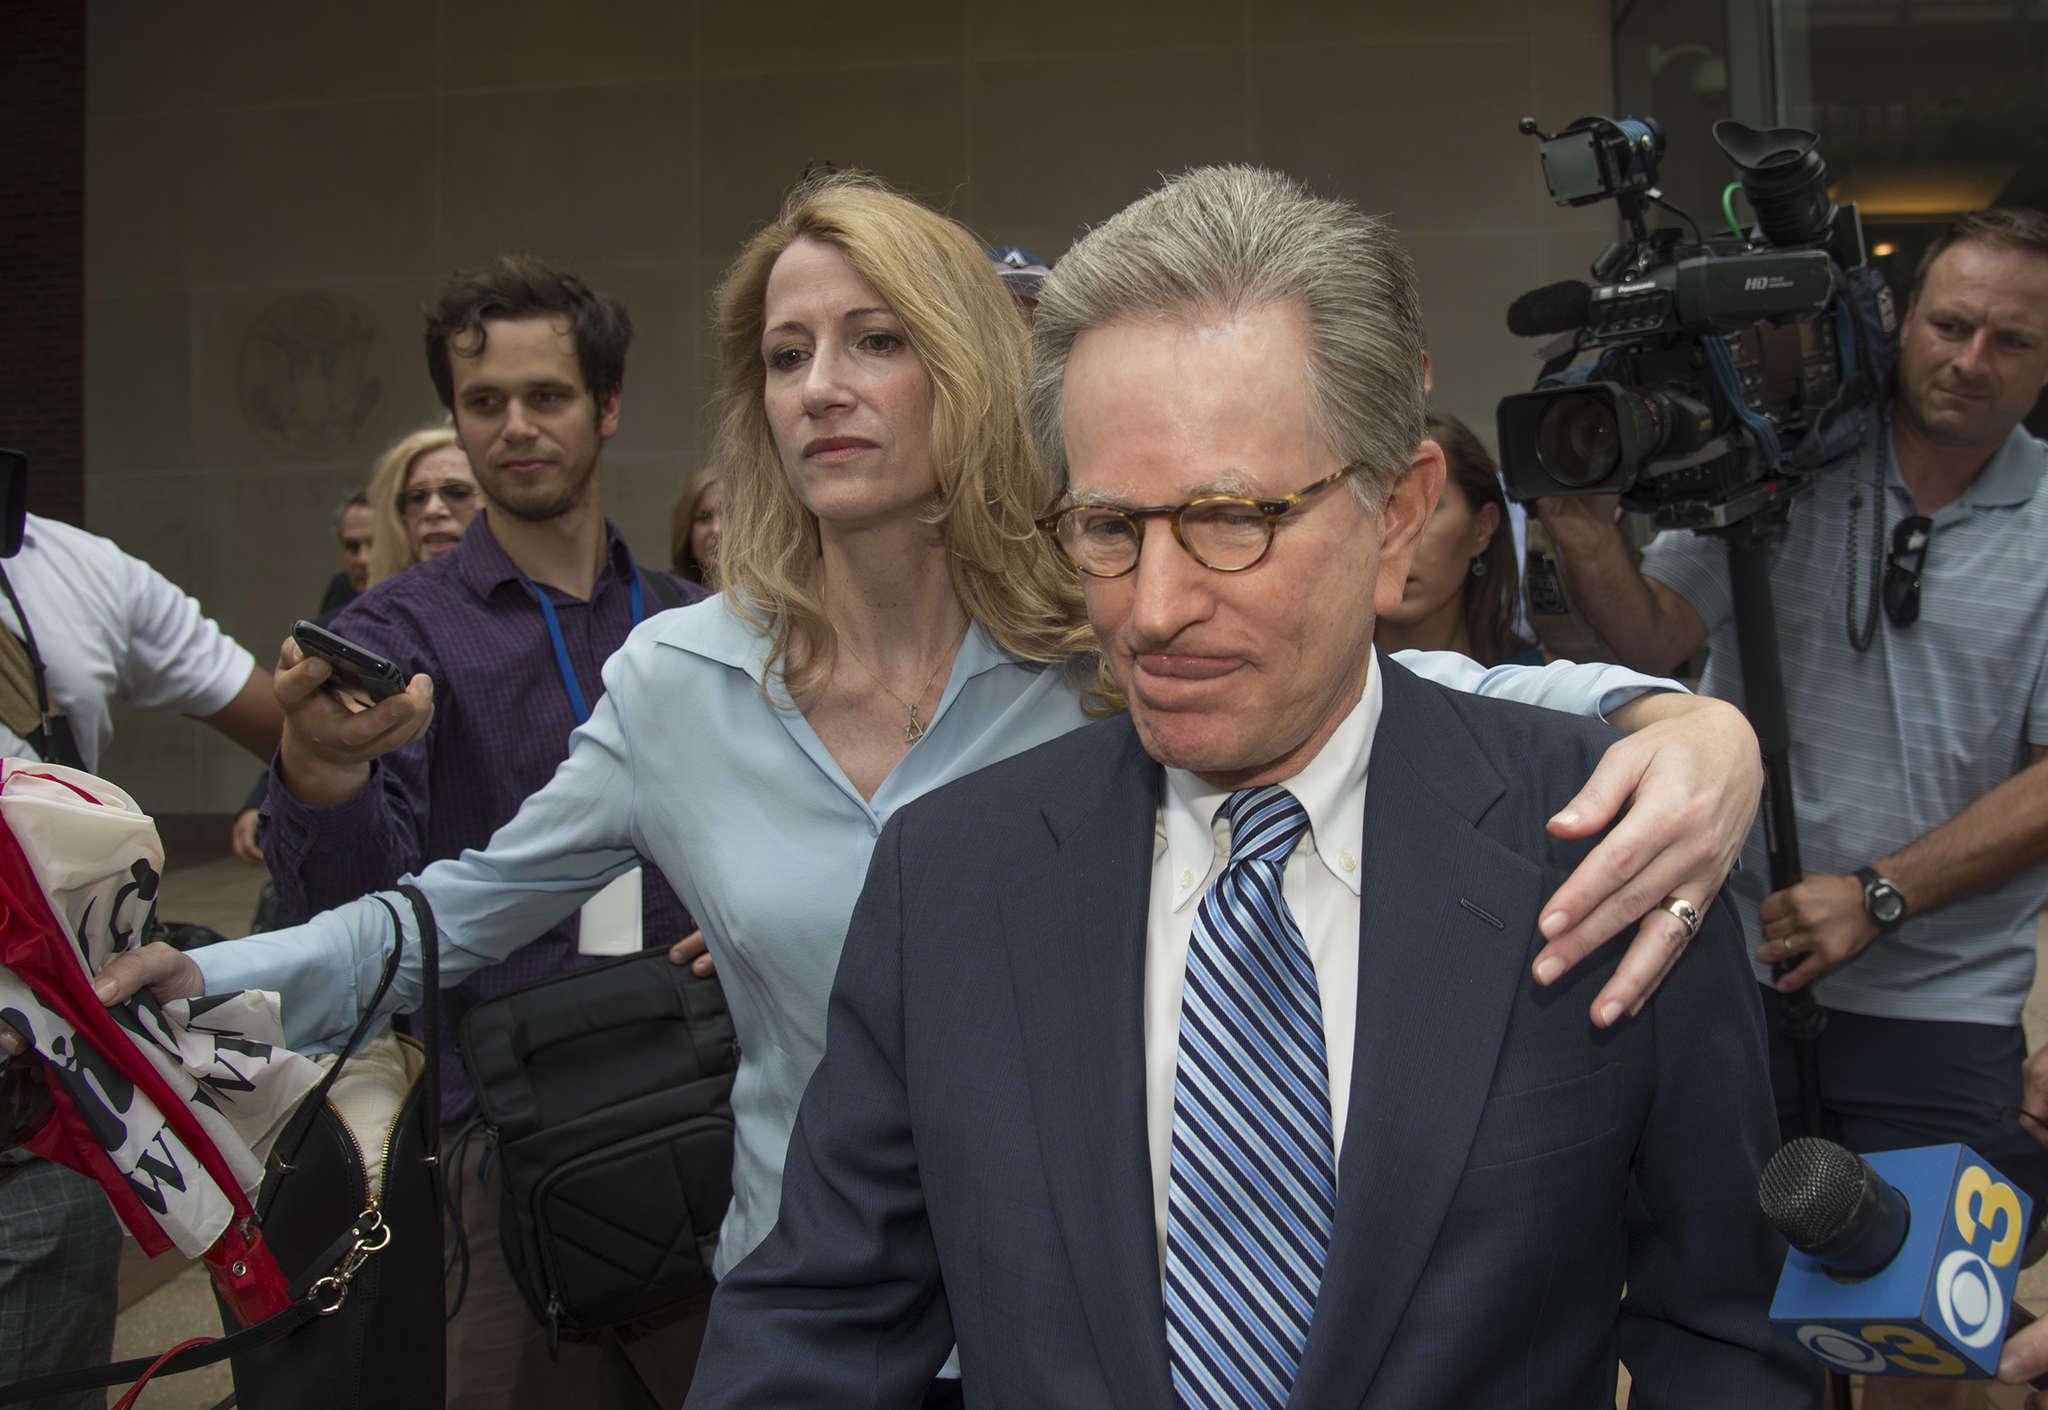 Herbert Vederman with niece Jaclyn Savitz. He was found guilty of bribing Chaka Fattah.